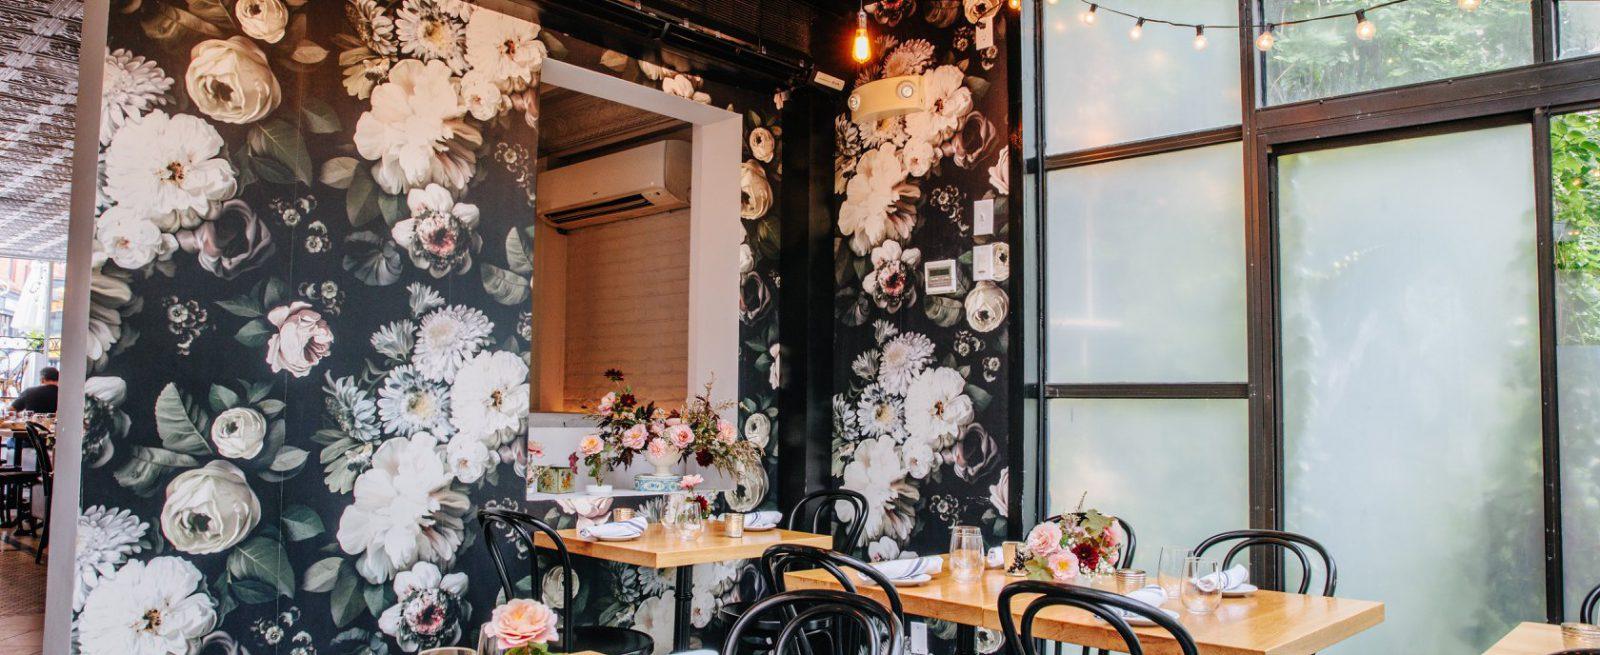 Latest Trends In Restaurant Interior Design Modern Restaurant Management The Business Of Eating Restaurant Management News